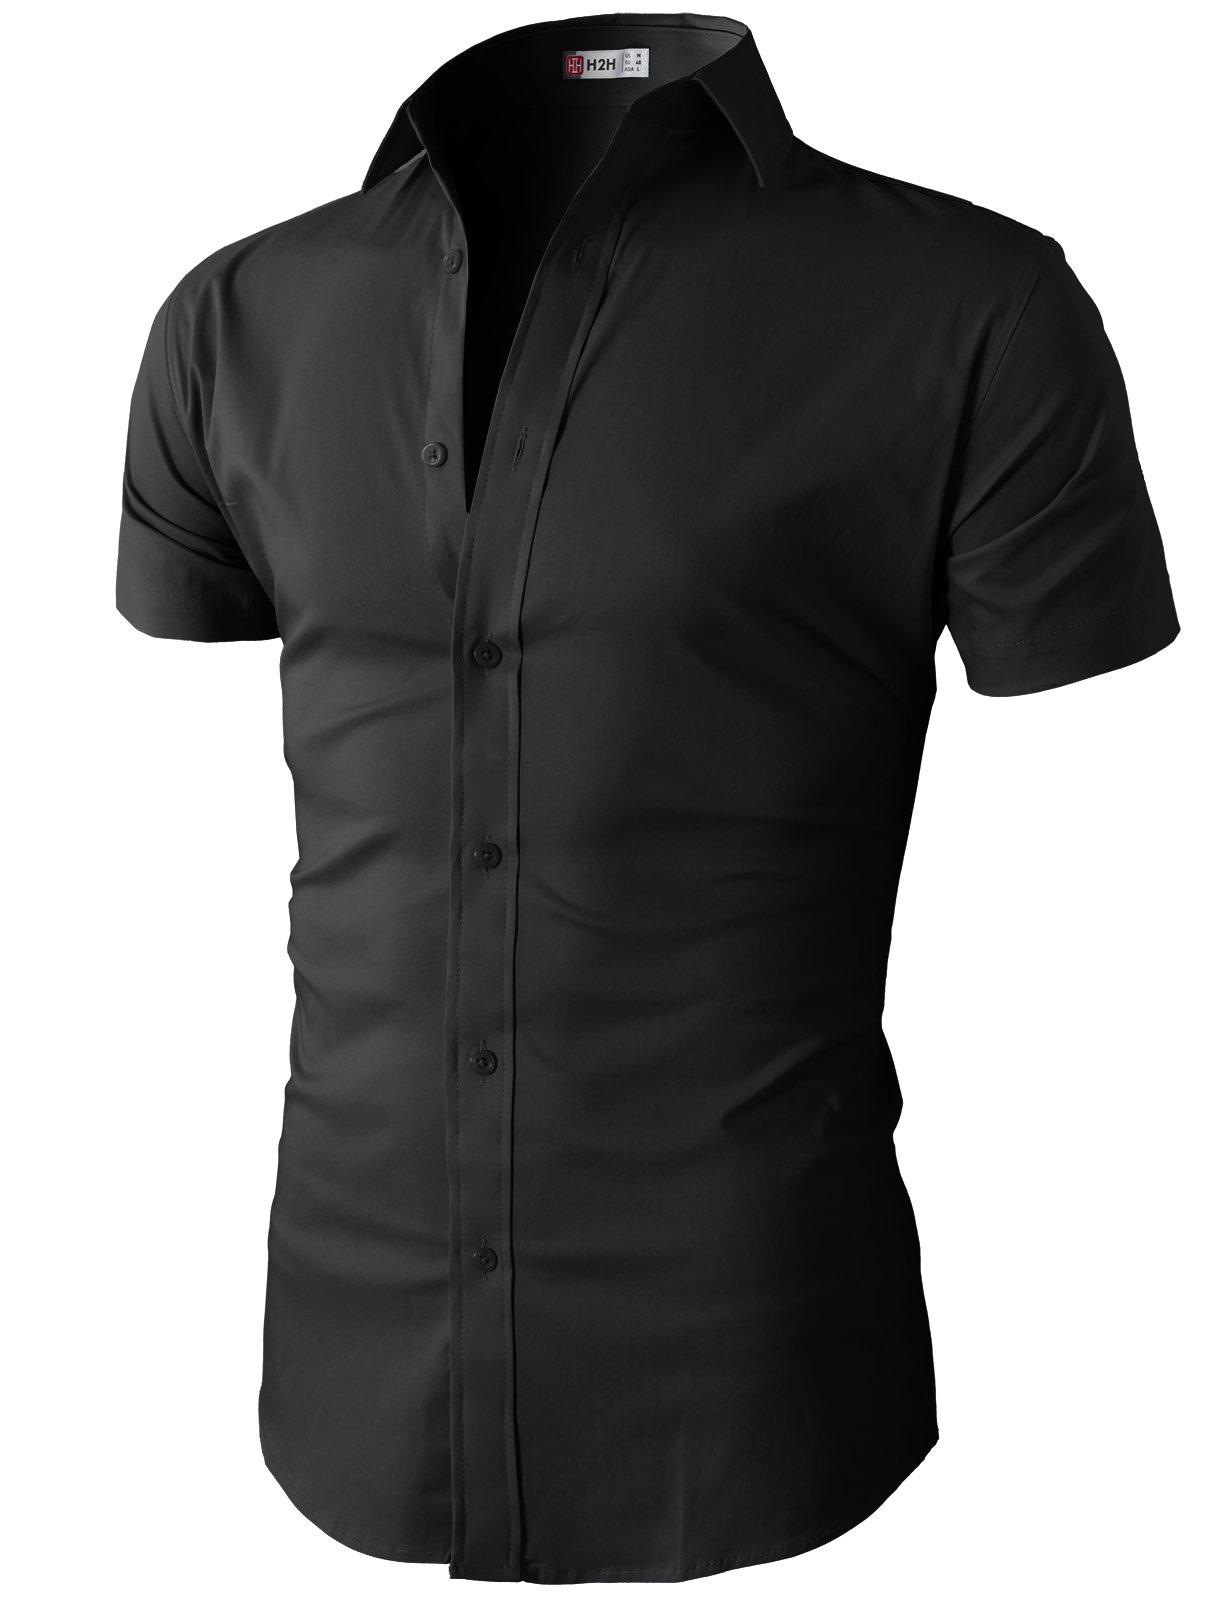 H2H Mens Casual Cotton Blend Short Sleeves Button Down Shirt Black US XL/Asia 2XL (KMTSTS0132)